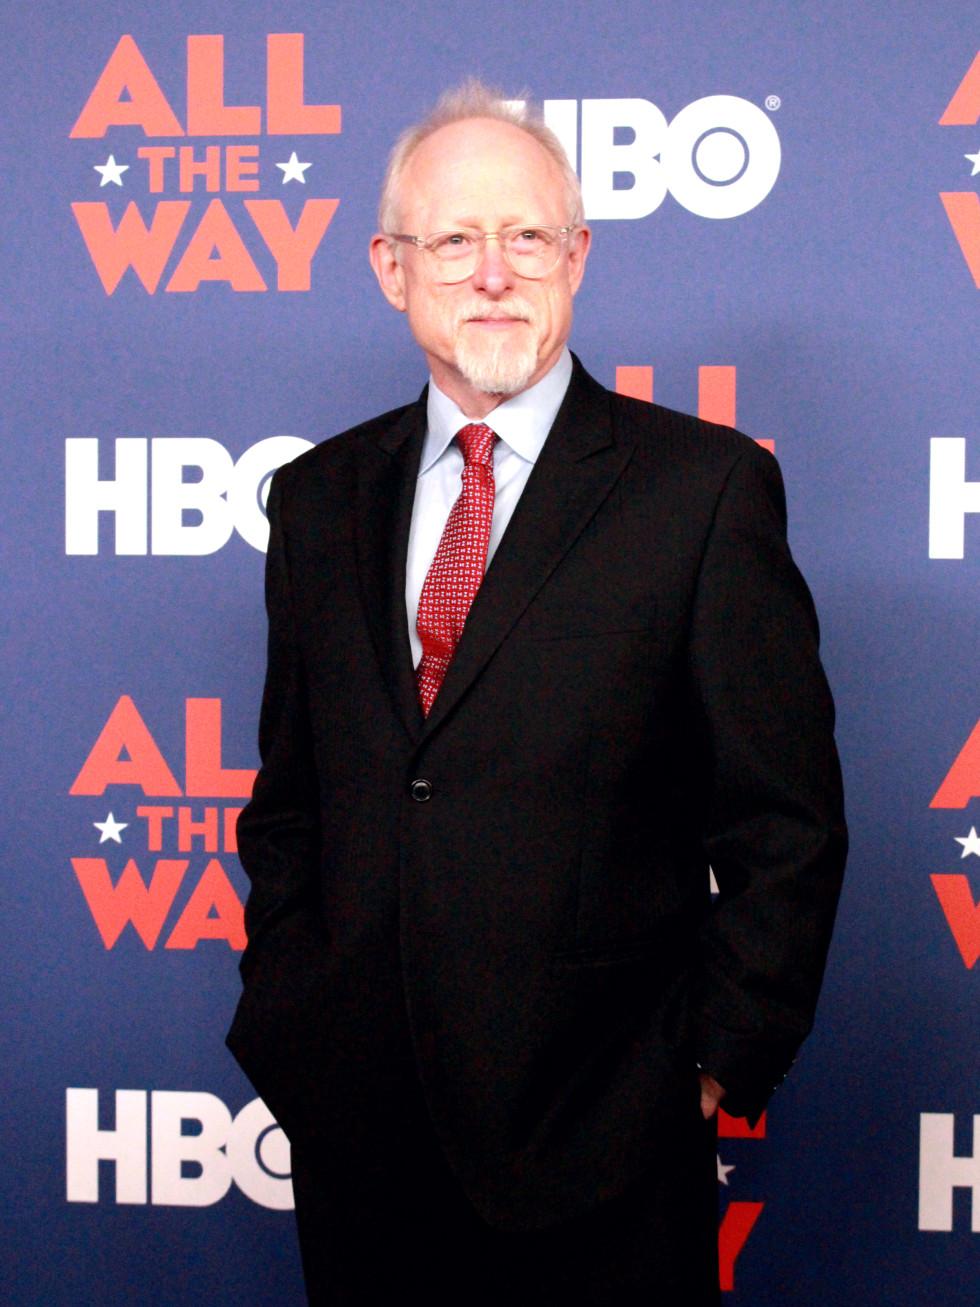 Austin premiere HBO film All the Way LBJ red carpet Robert Schenkkan